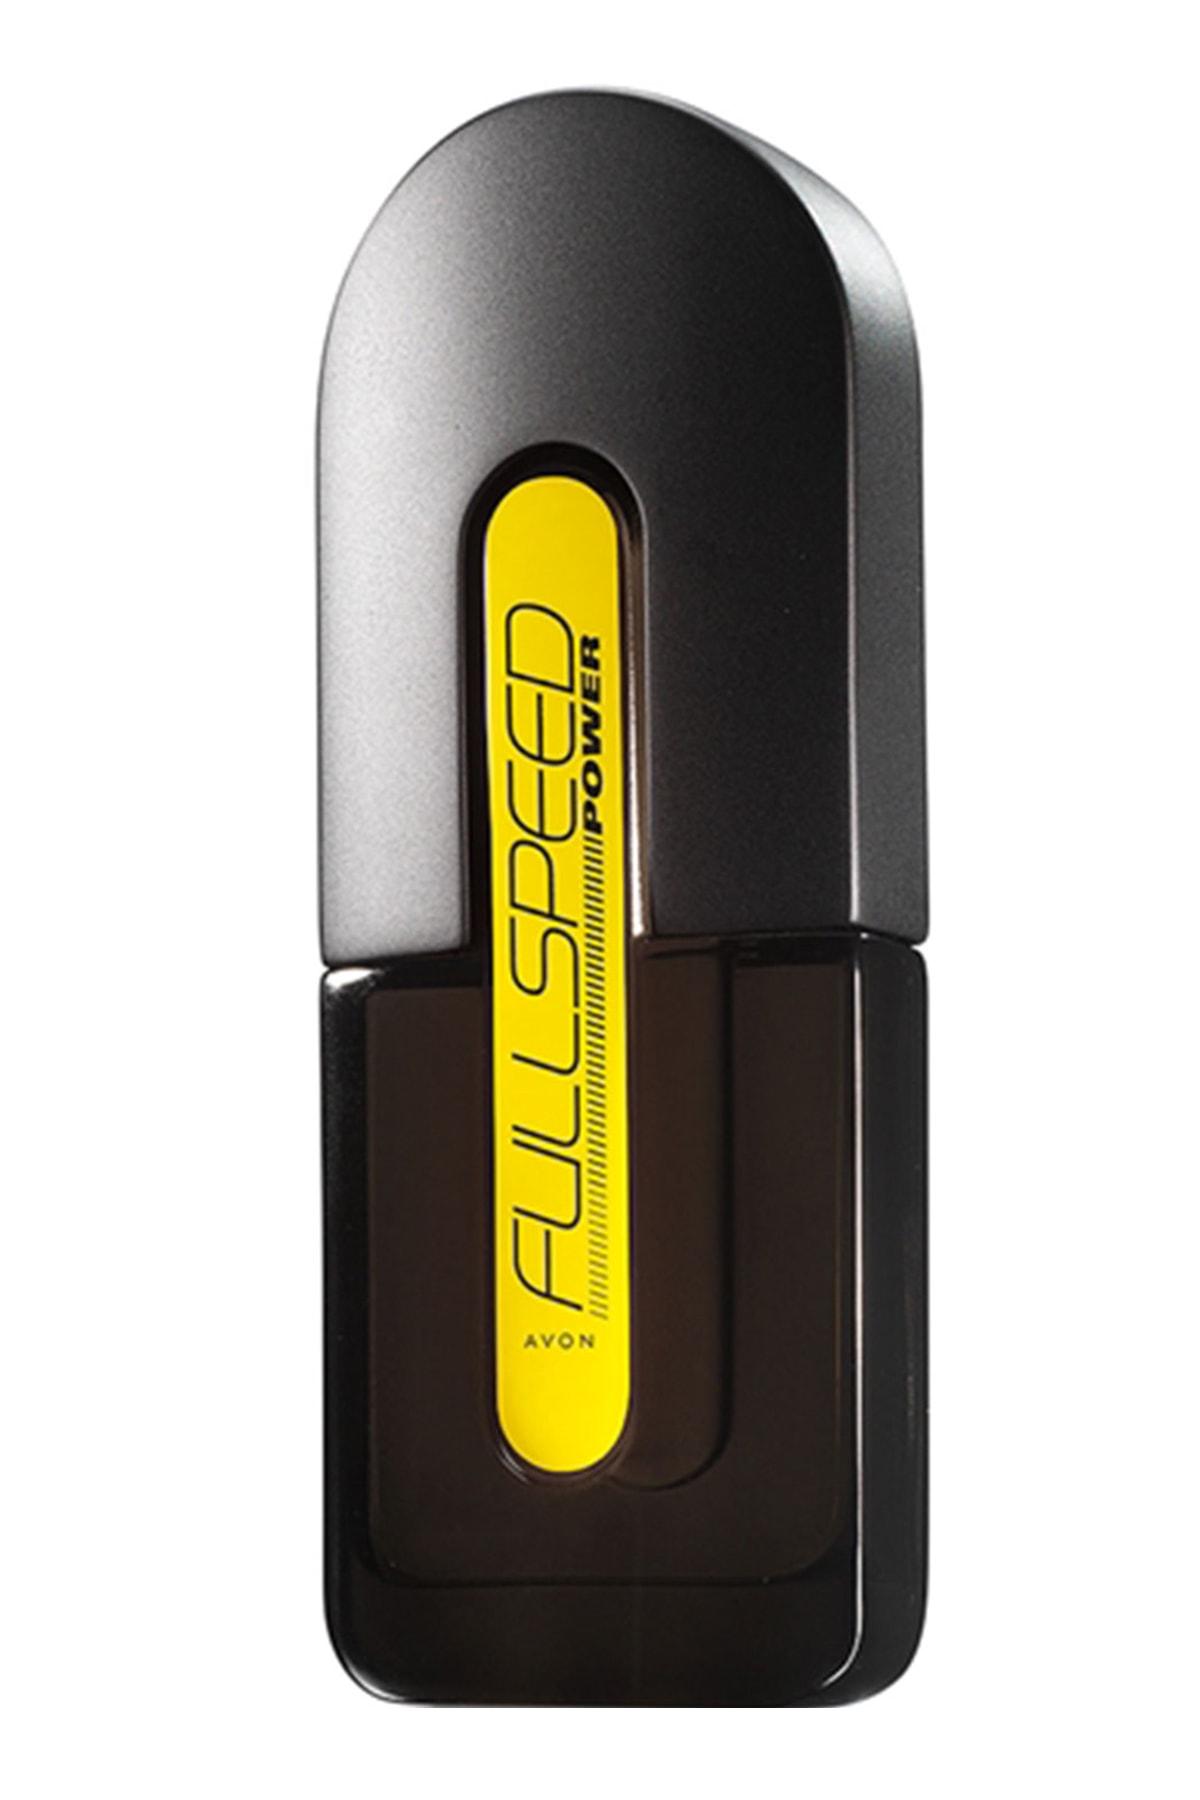 AVON Full Speed Power Edt 75 ml Erkek Parfümü 8681298910411 1